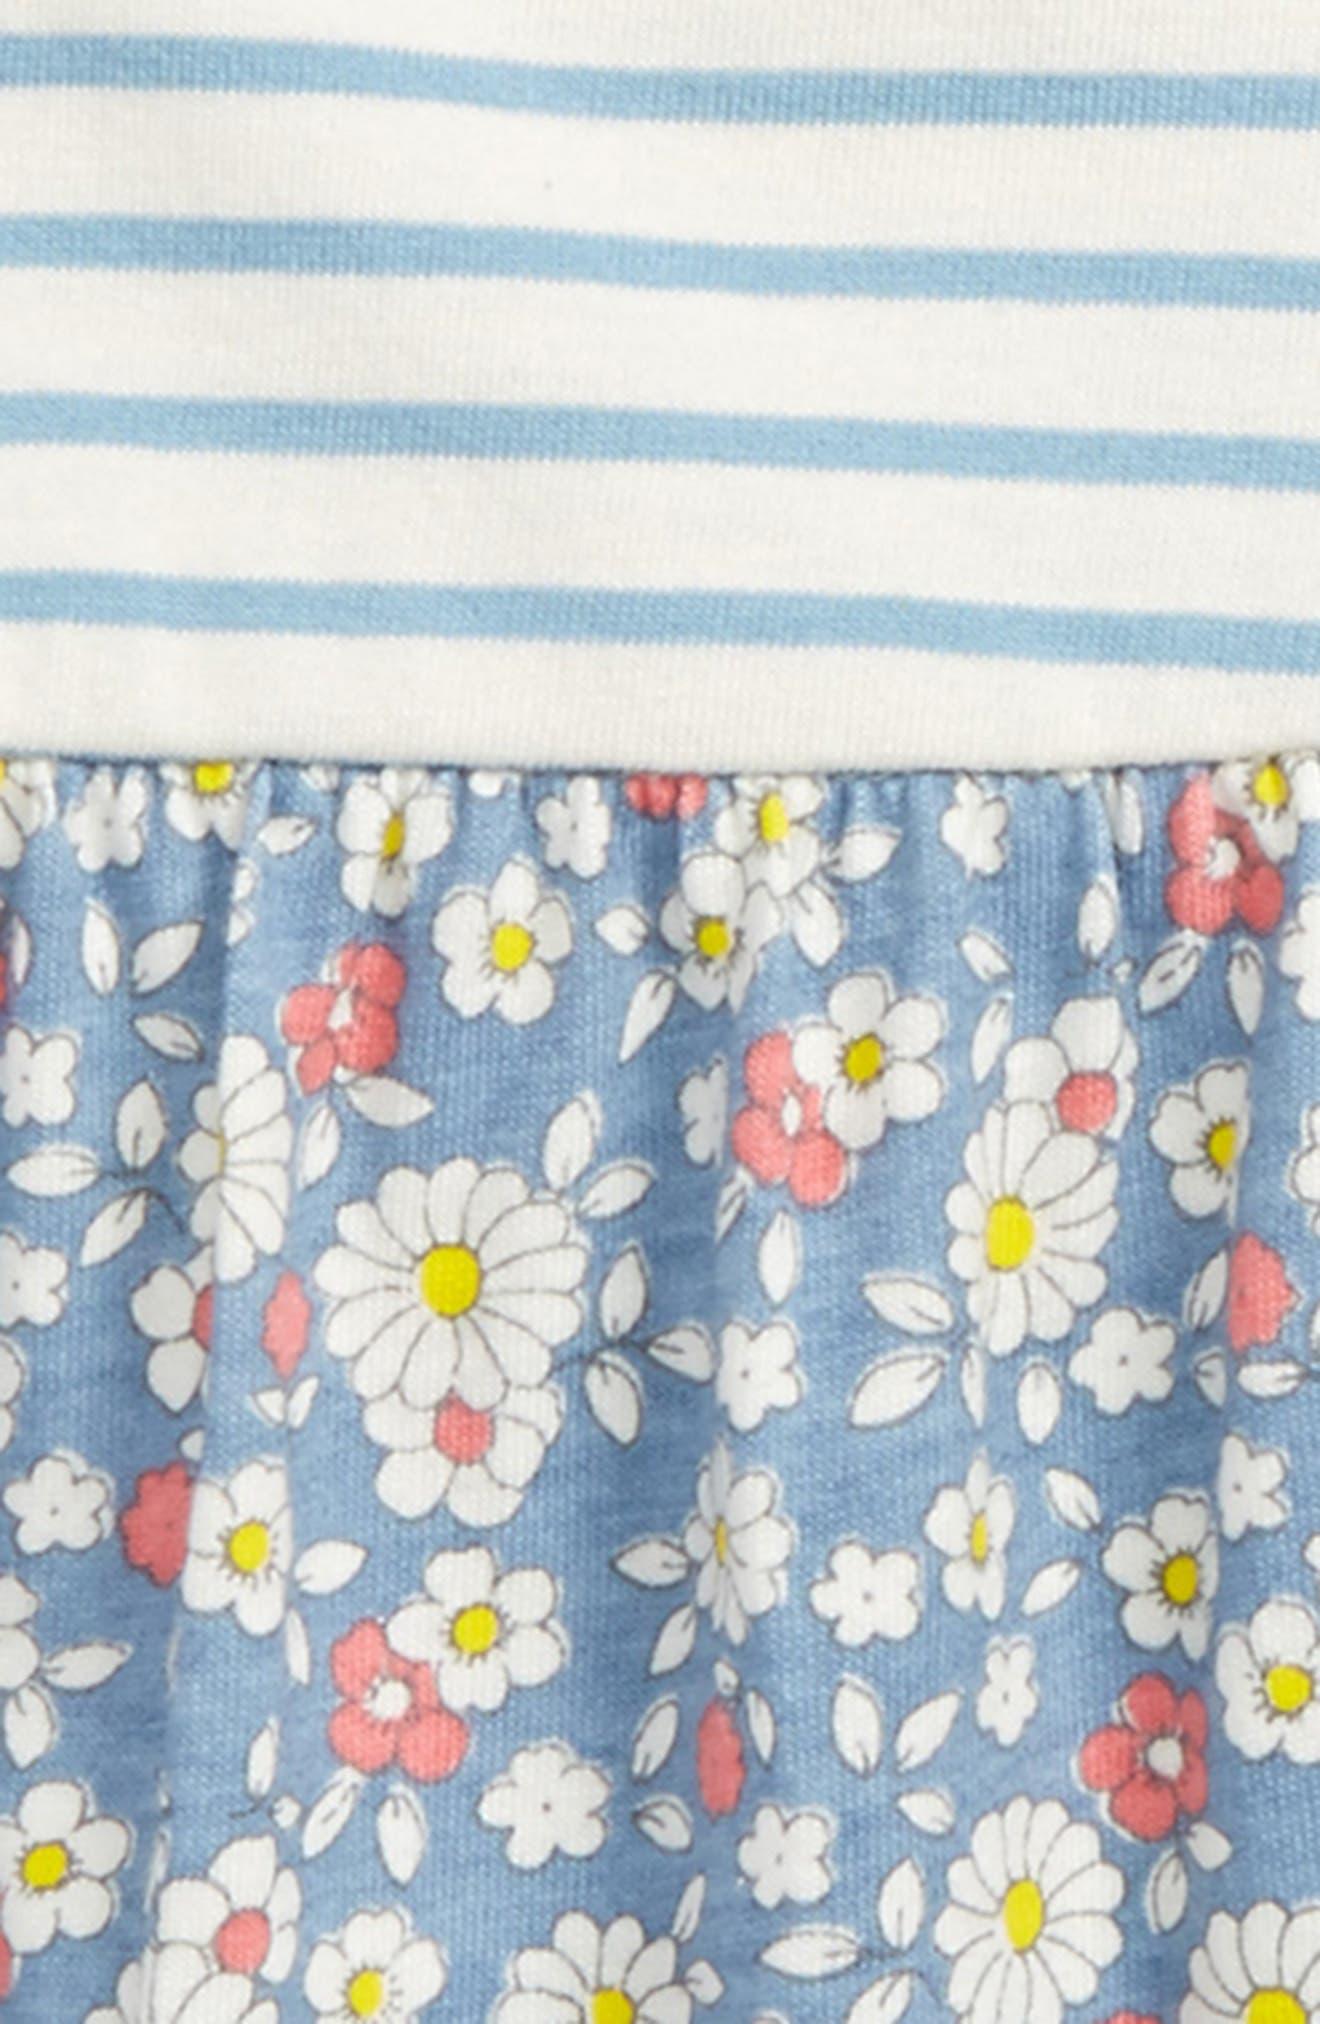 Hotchpotch Dress,                             Alternate thumbnail 2, color,                             Blue Wren Vintage Daisy